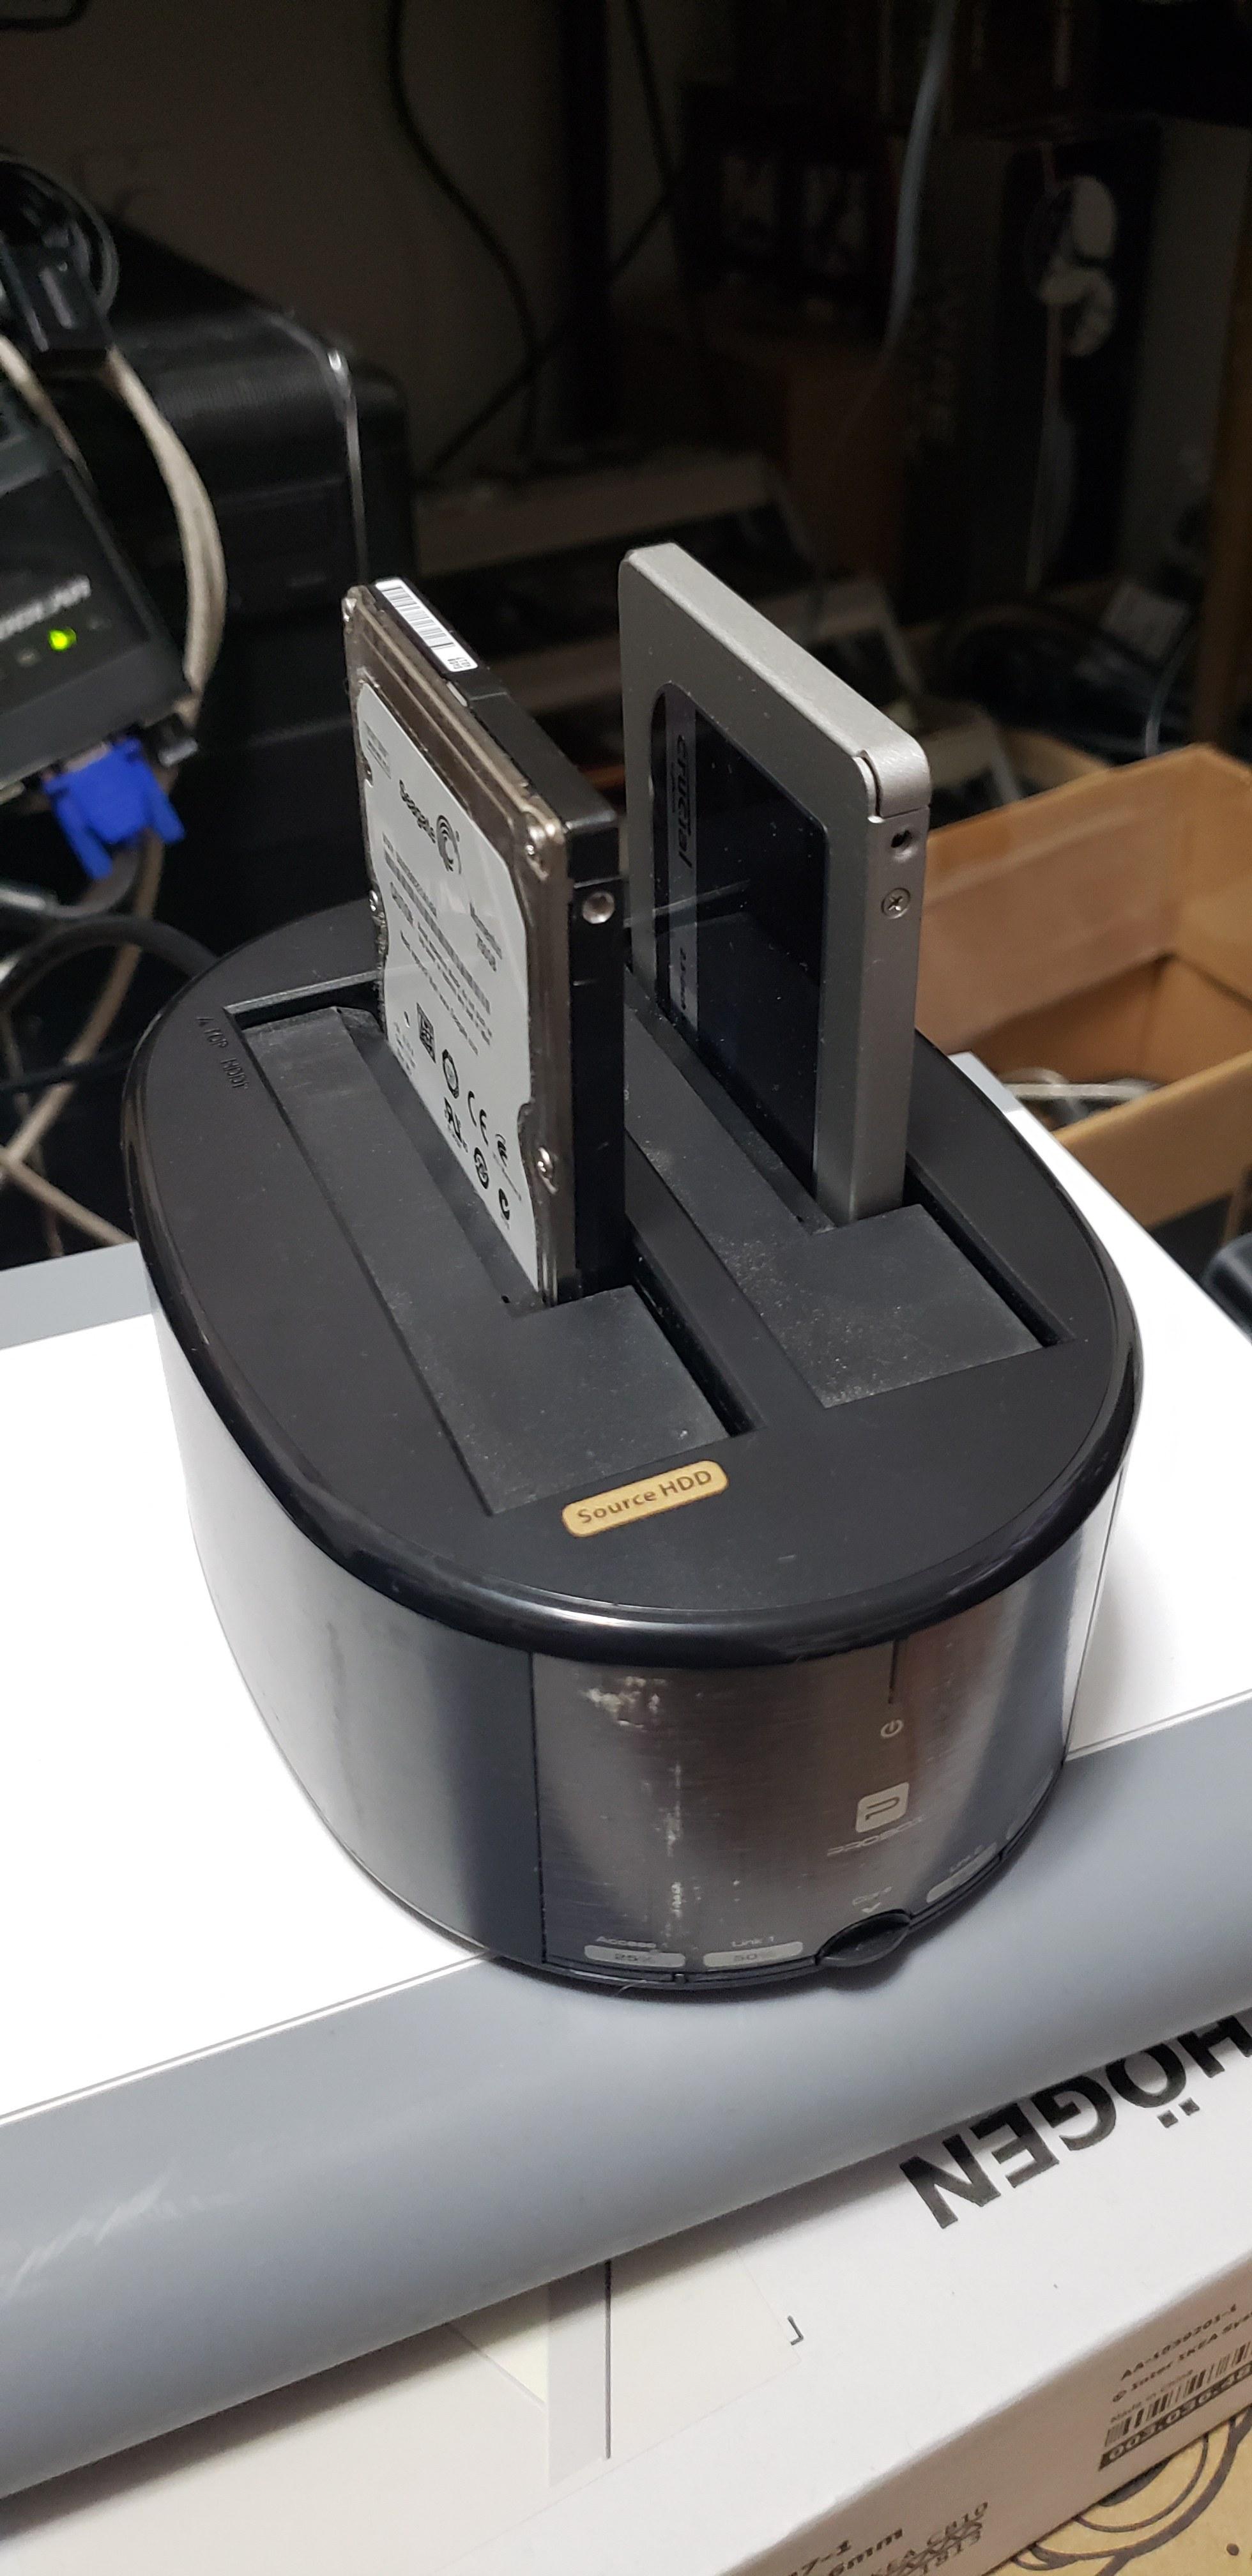 hard drive to SSD cloning using USB docking station